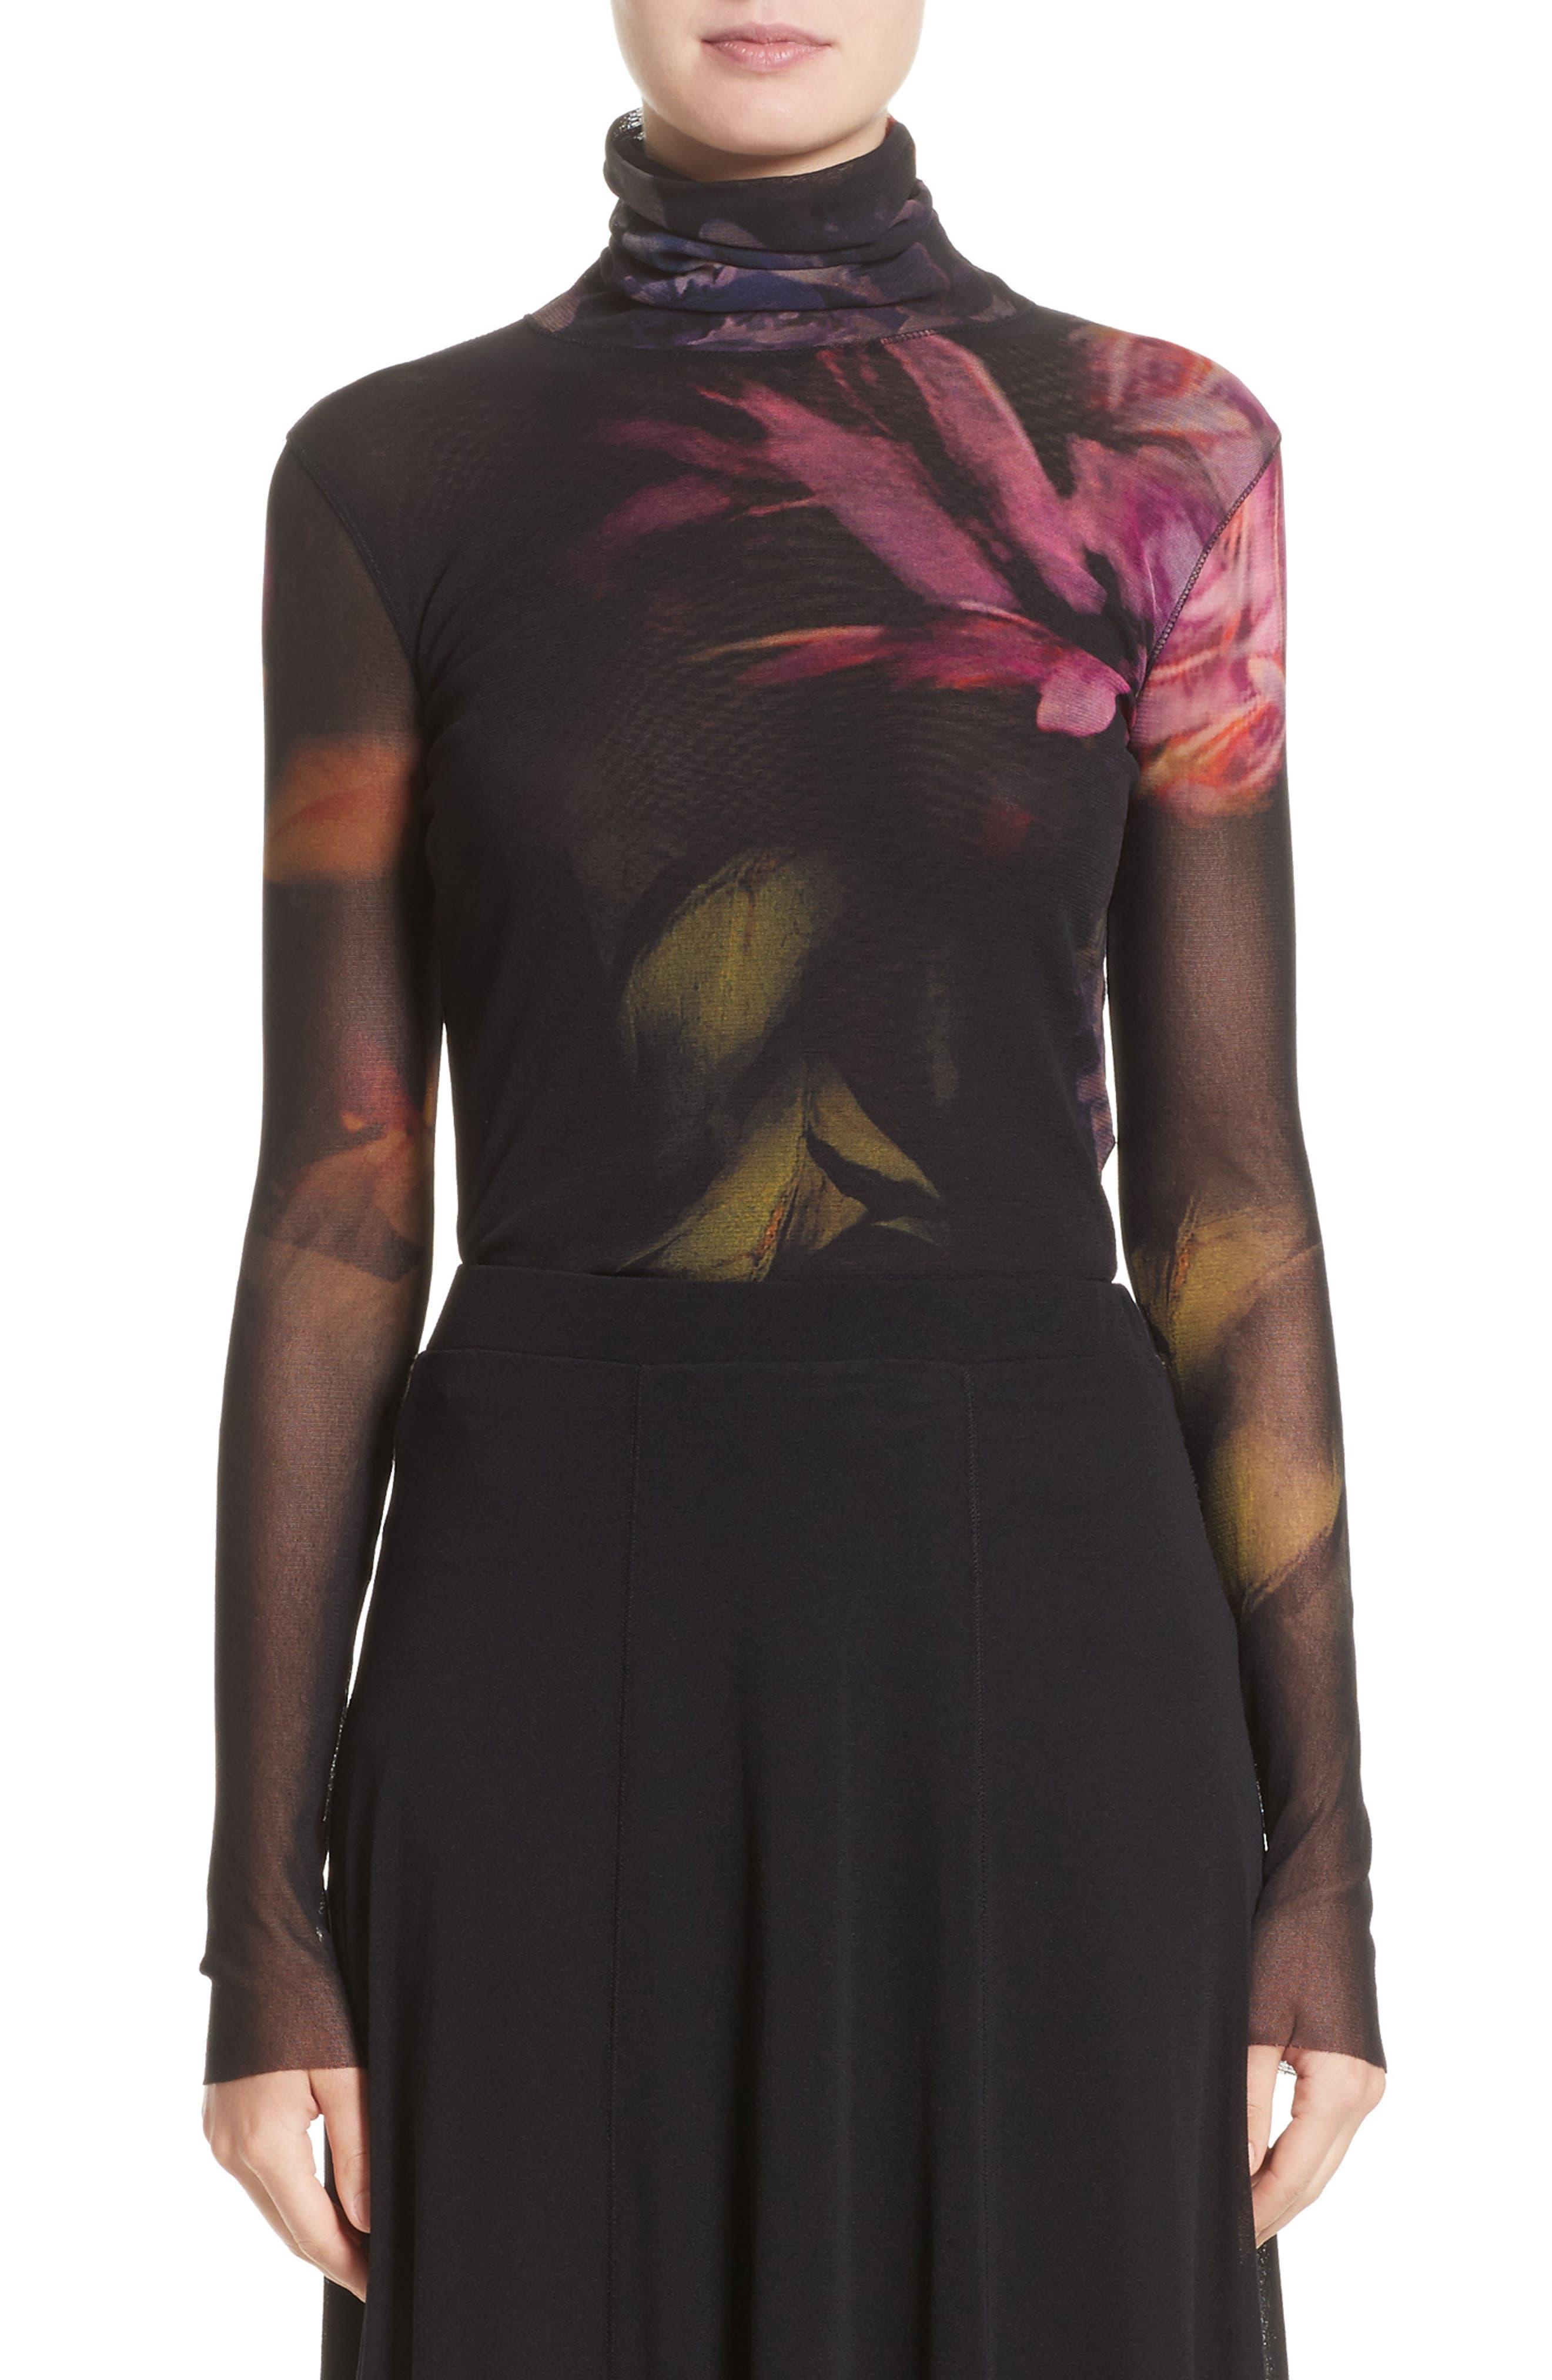 Main Image - Fuzzi Floral Print Tulle Turtleneck Top